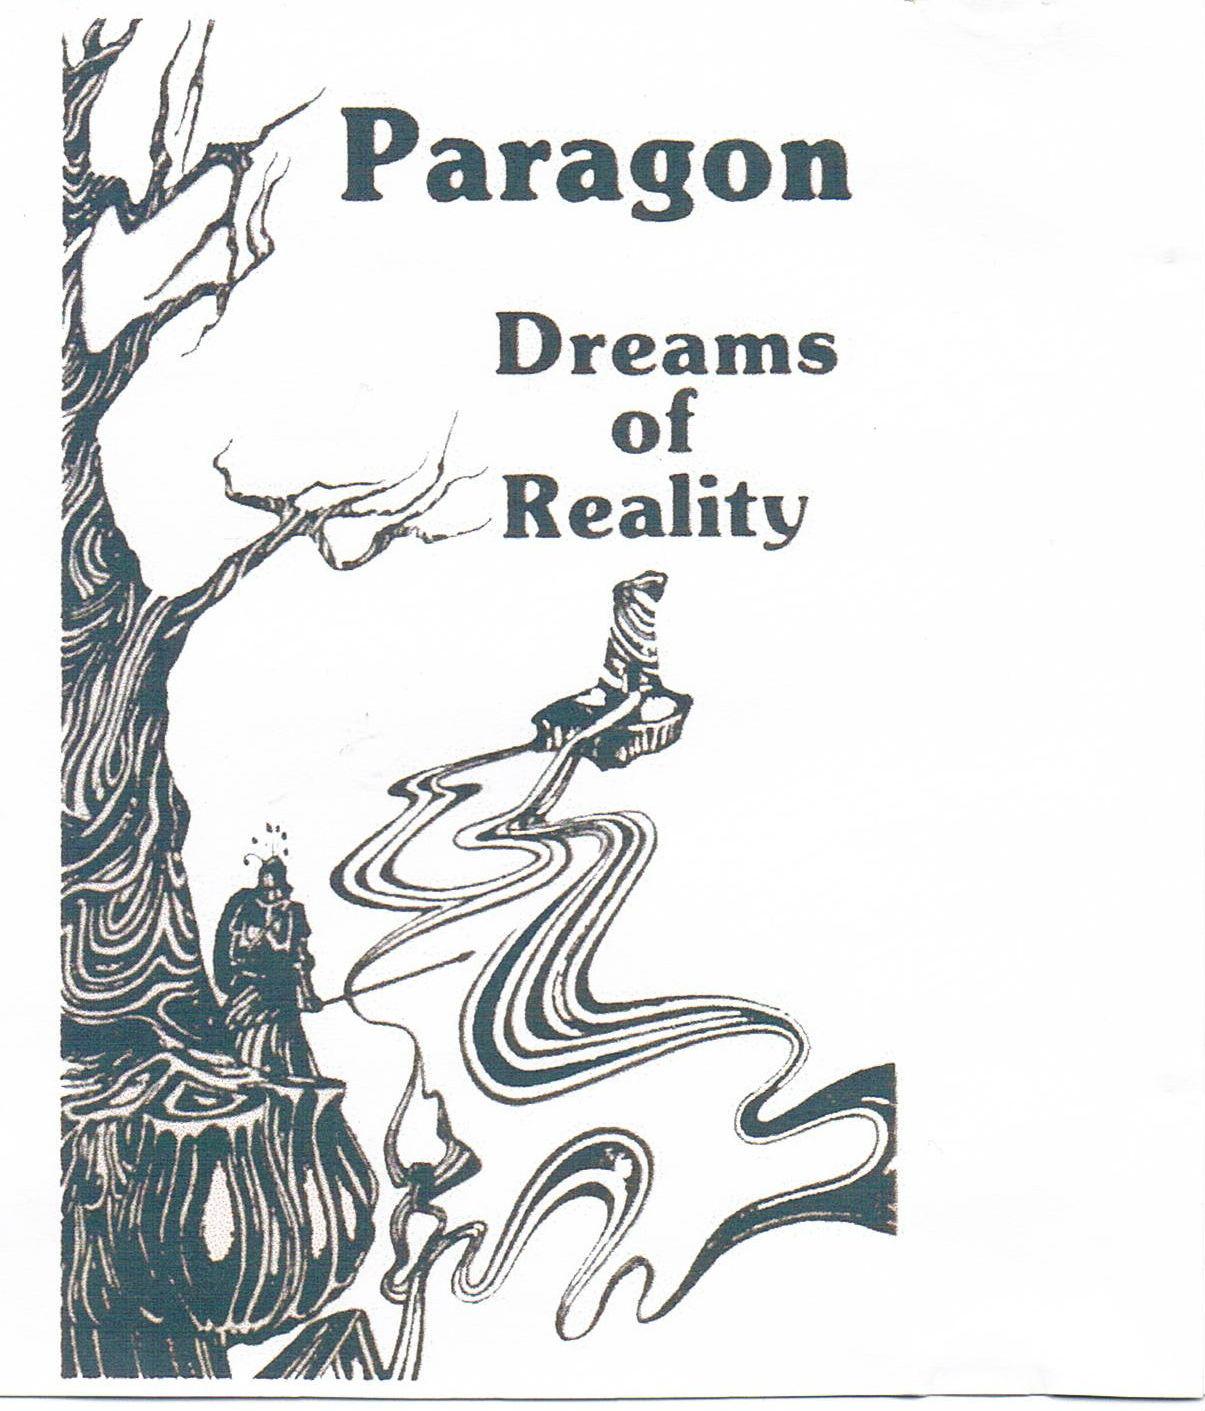 DreamsOfReality